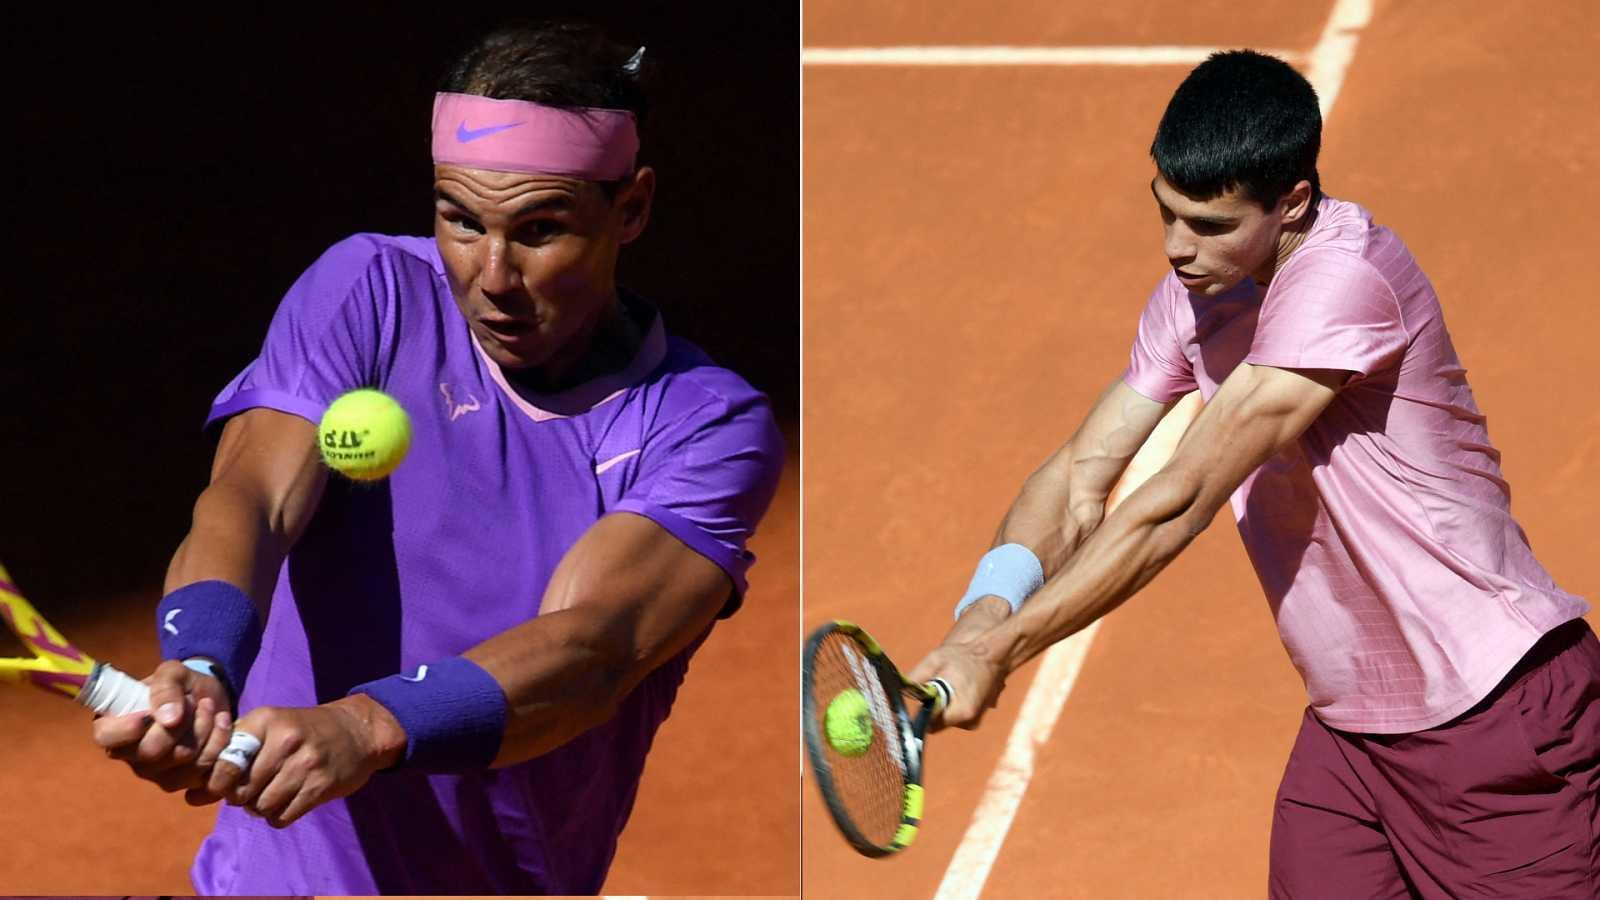 Tenis - ATP Mutua Madrid Open: Rafa Nadal - Carlos Alcaraz - ver ahora